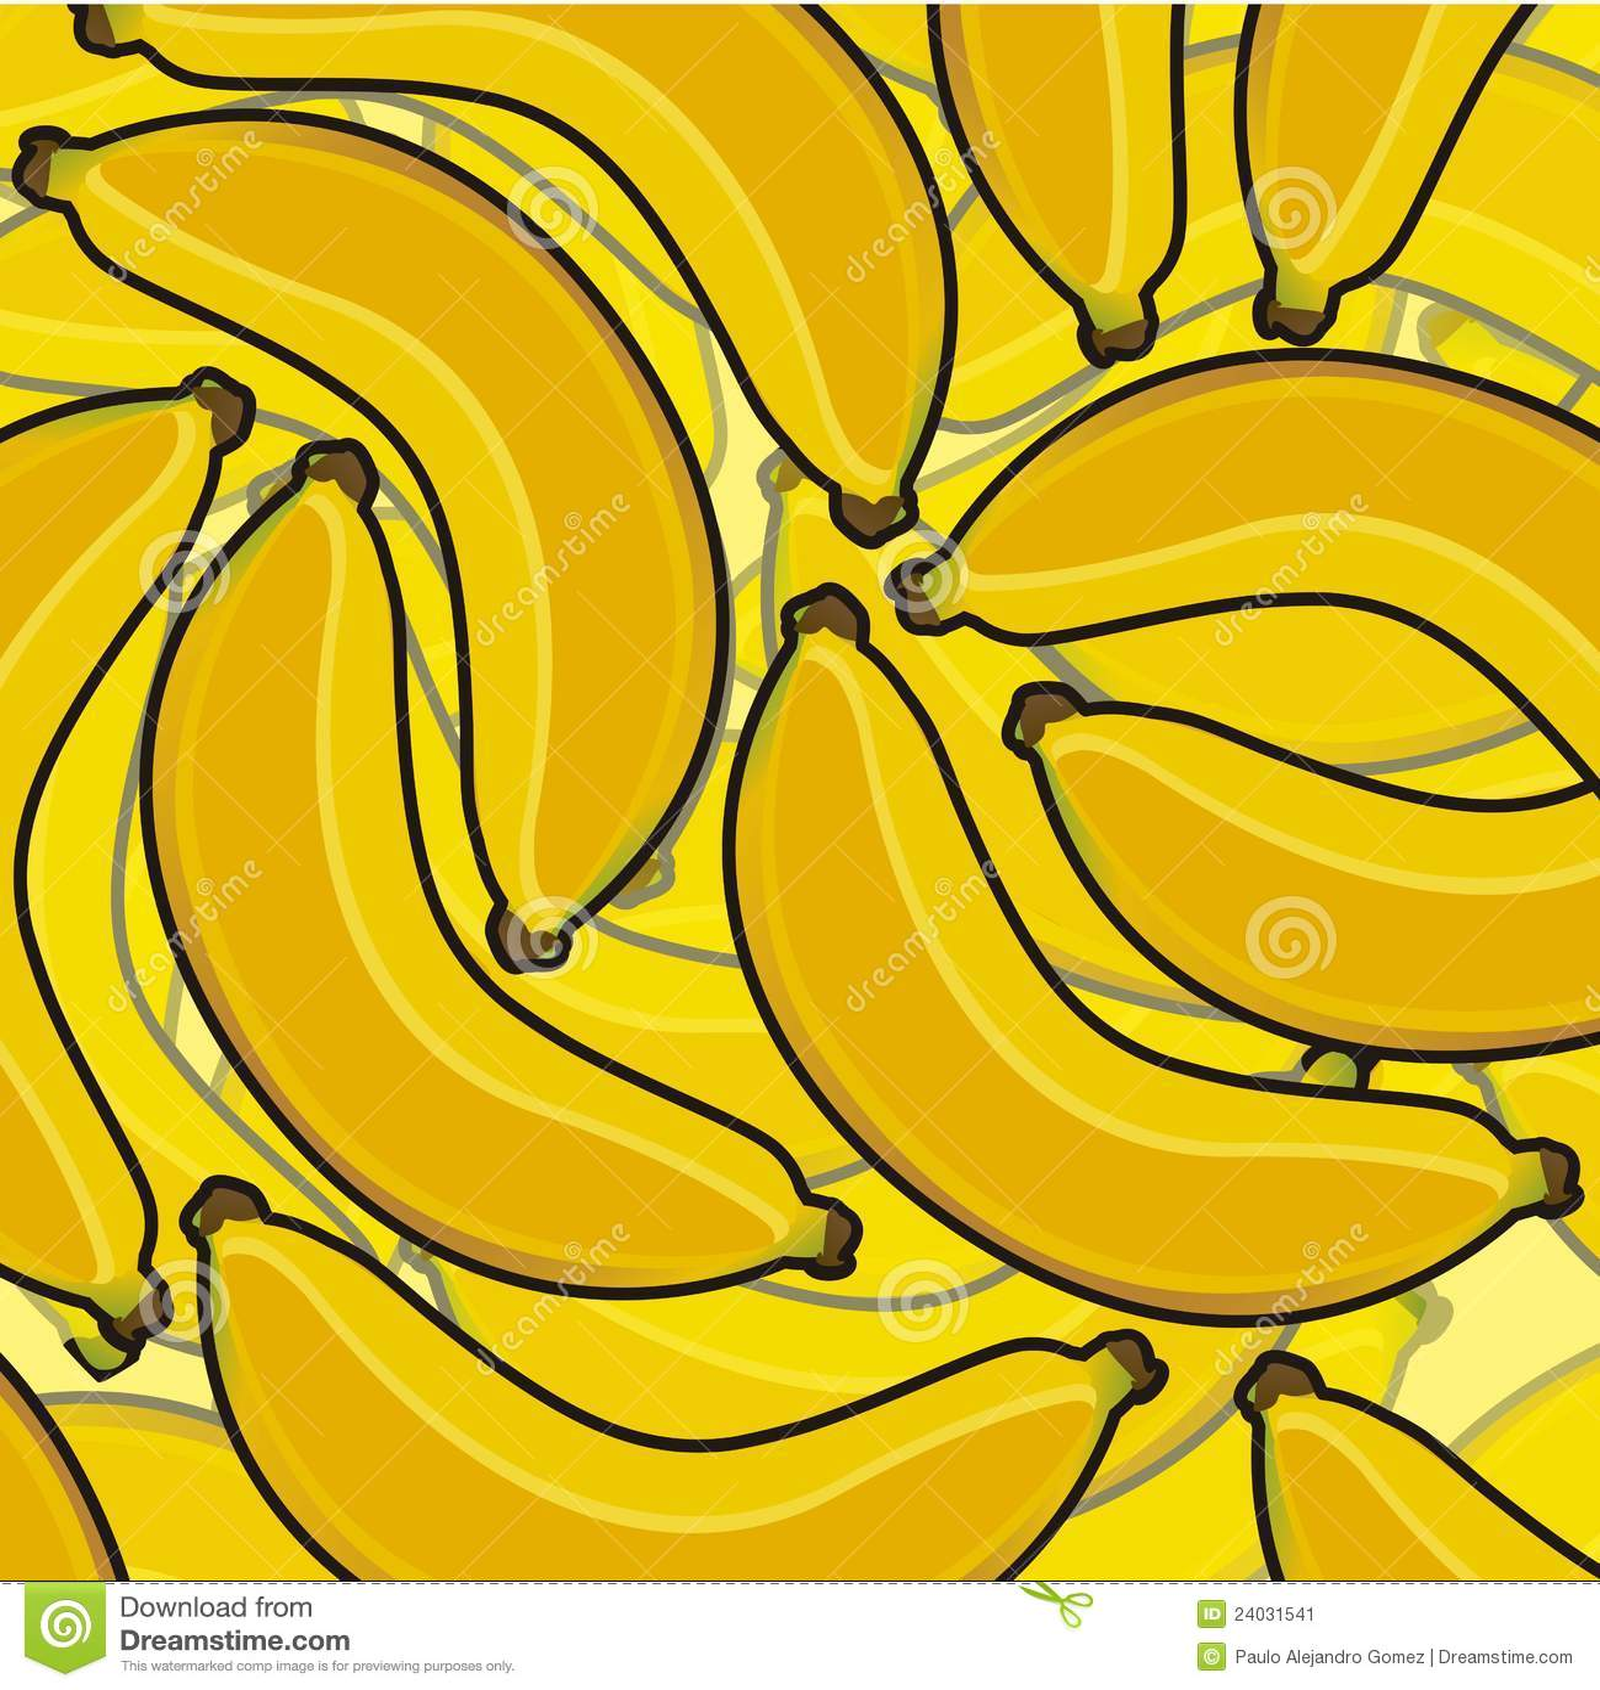 Banana cartoon background stock vector. Illustration of ...